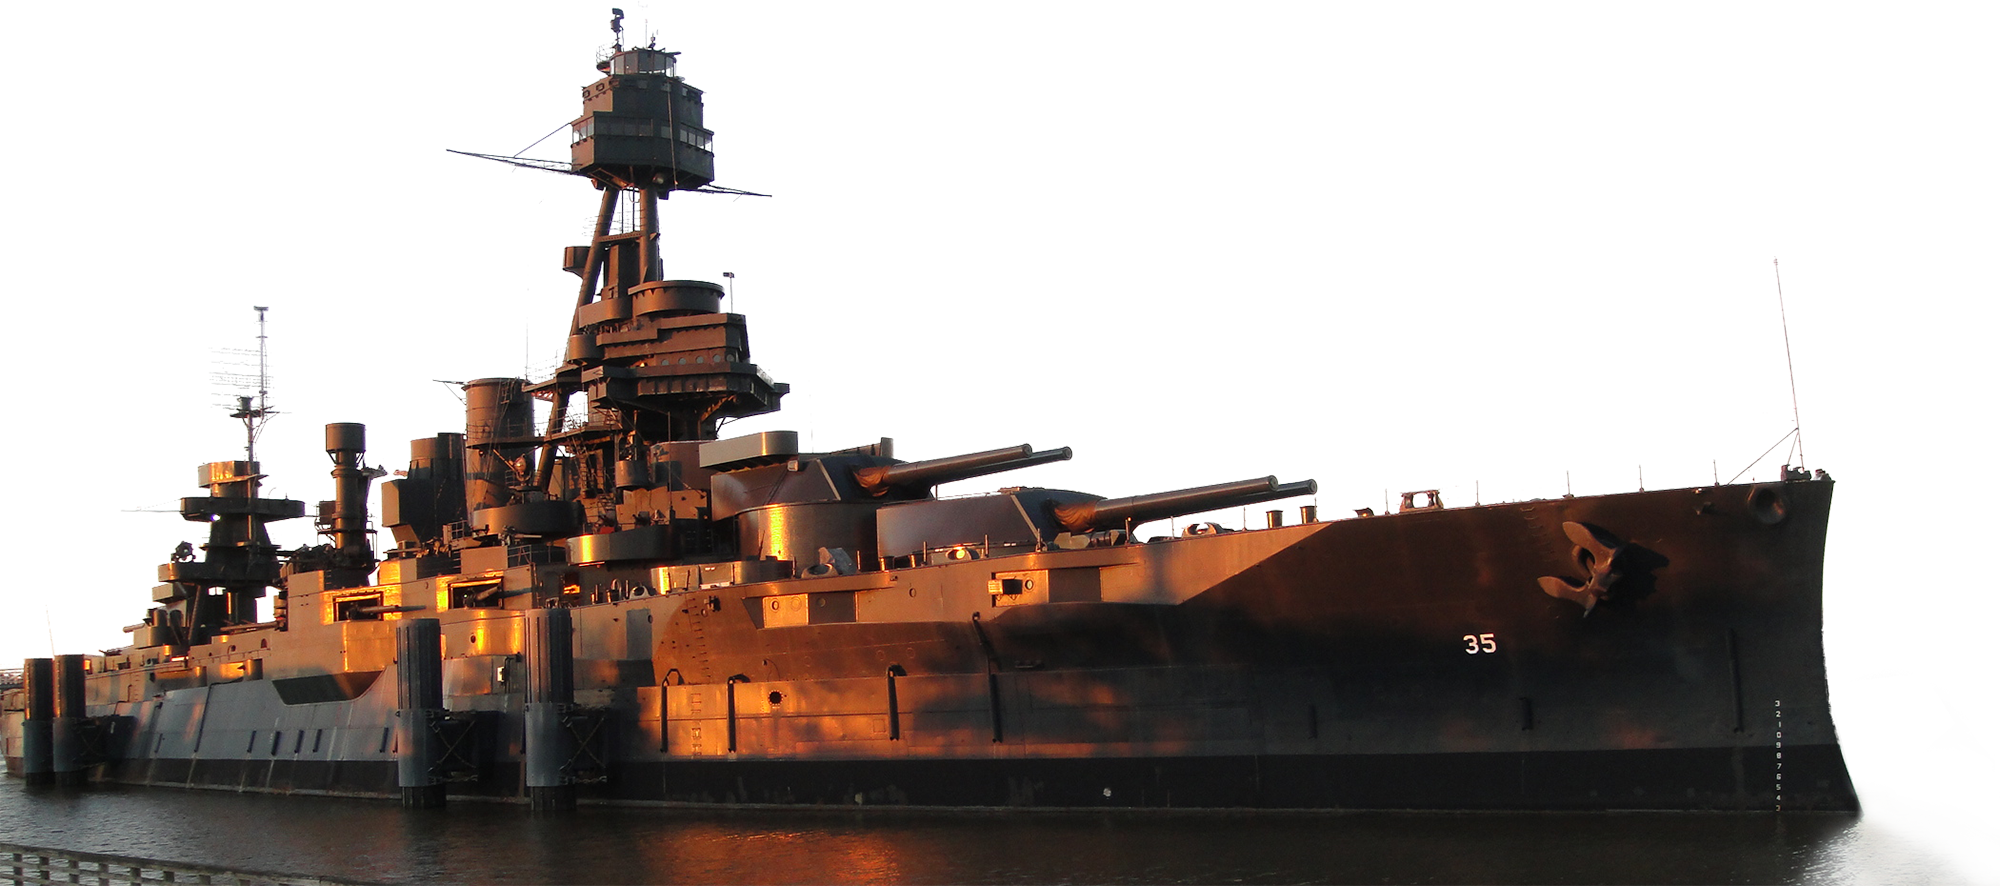 Navy clipart dreadnought. The battleship texas foundation